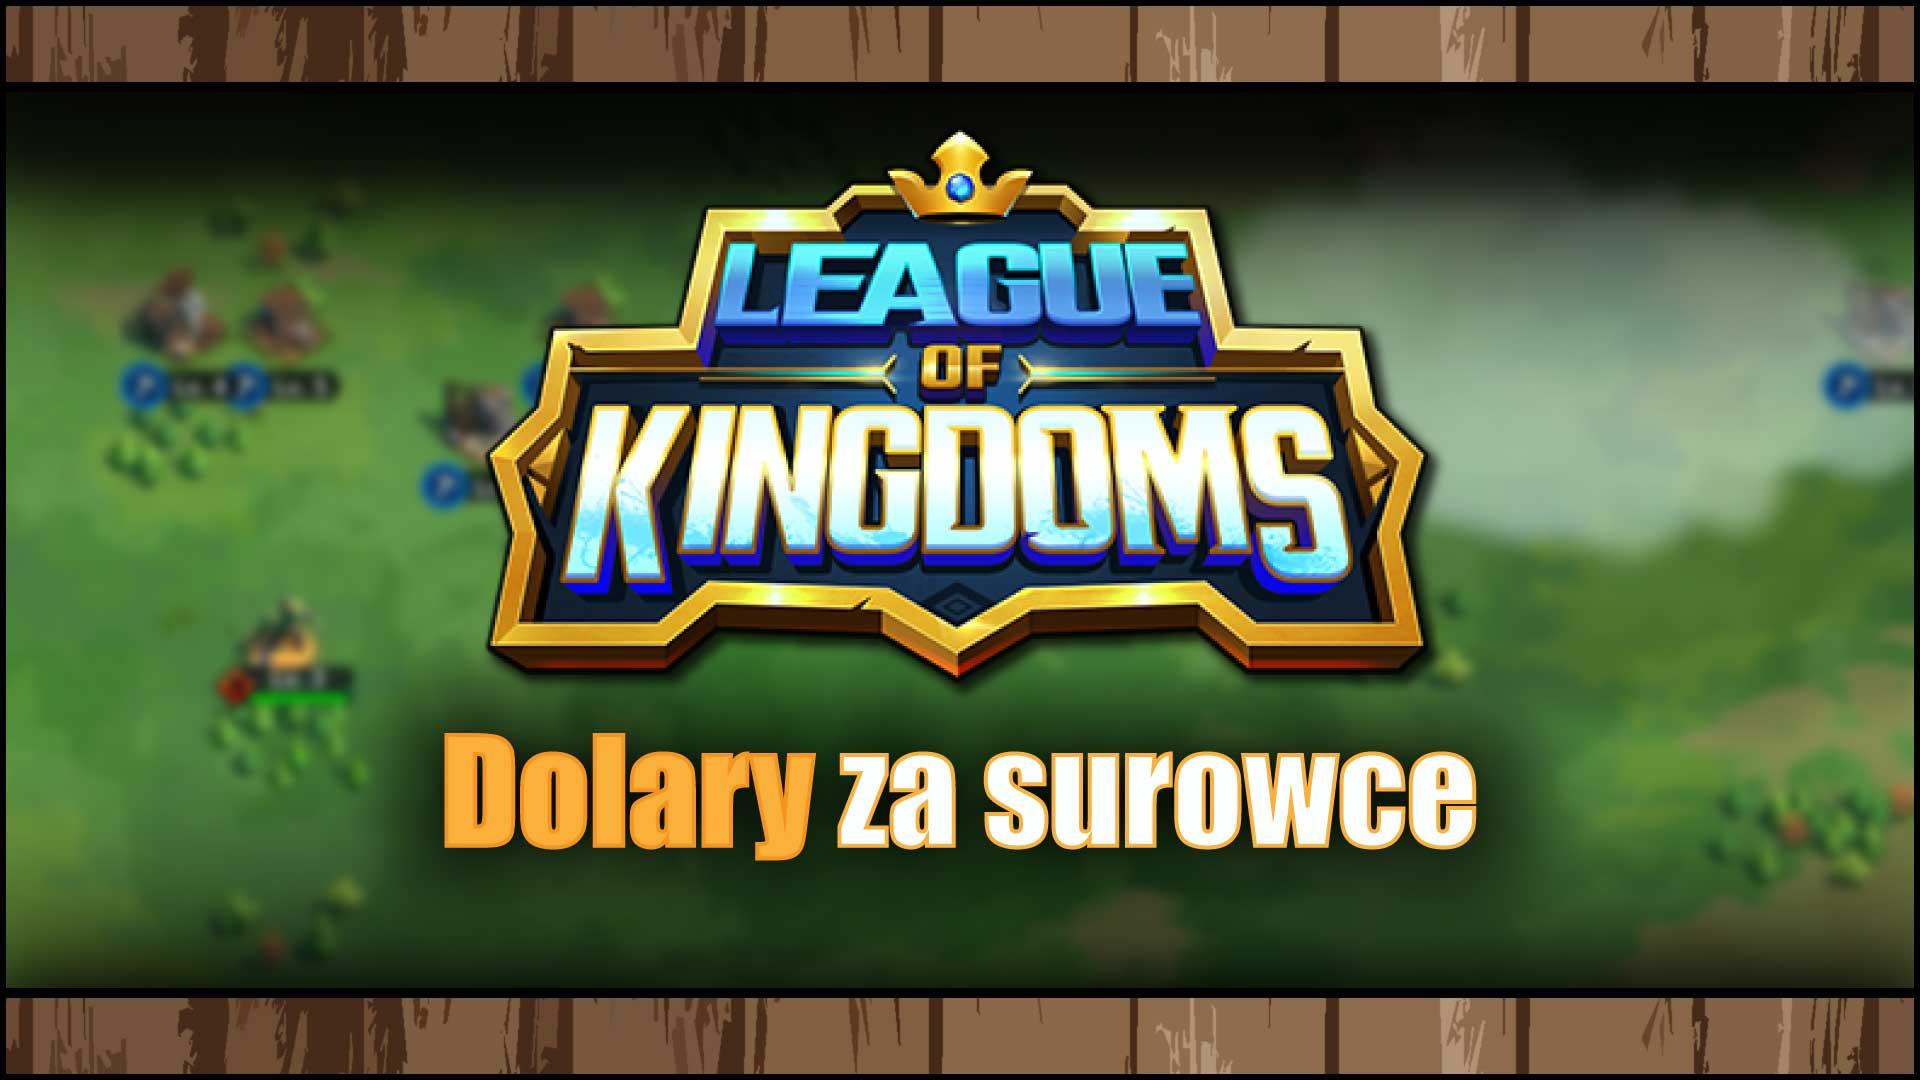 League of Kingdoms Blockchain MMO